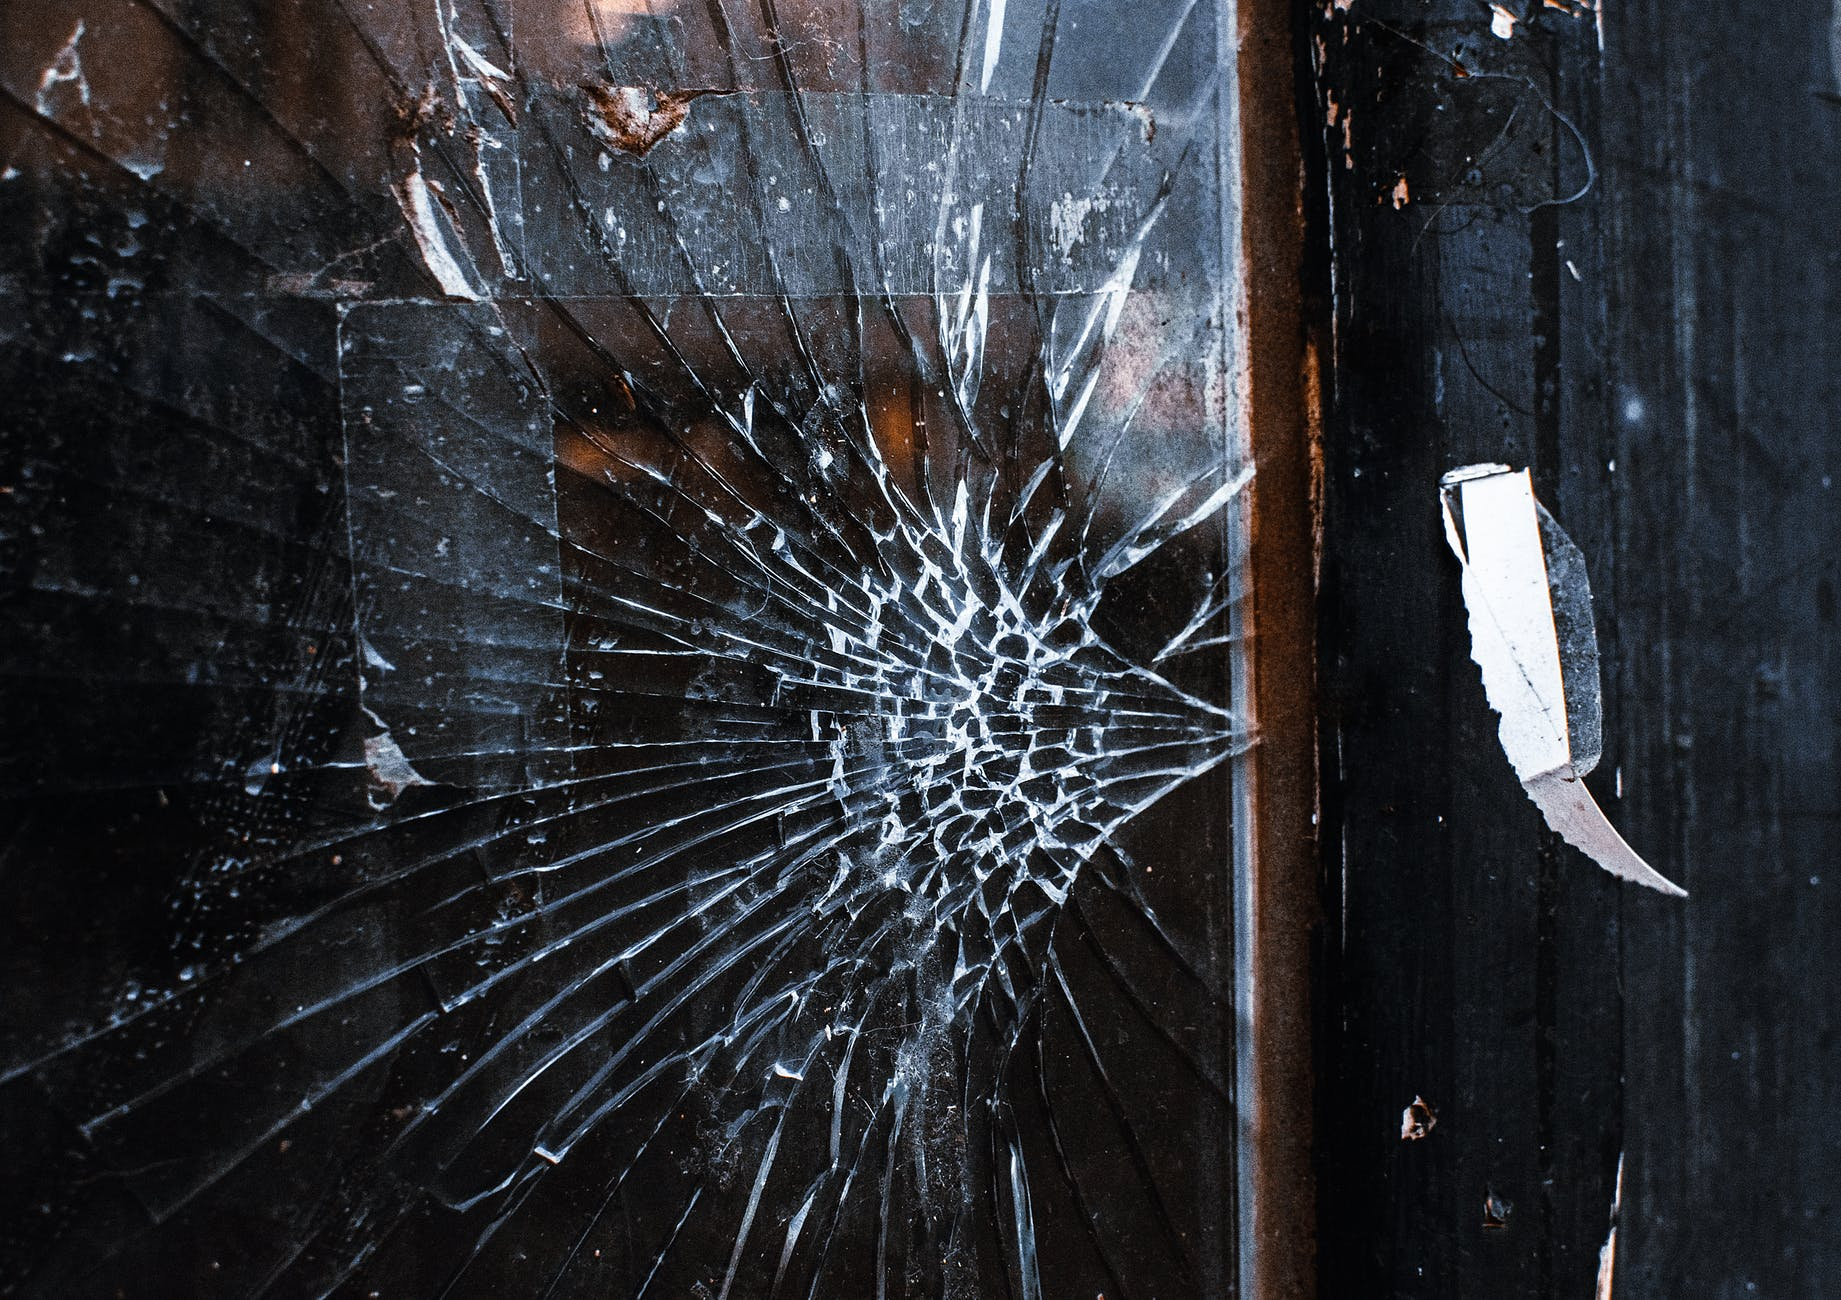 broken glass on wooden surface